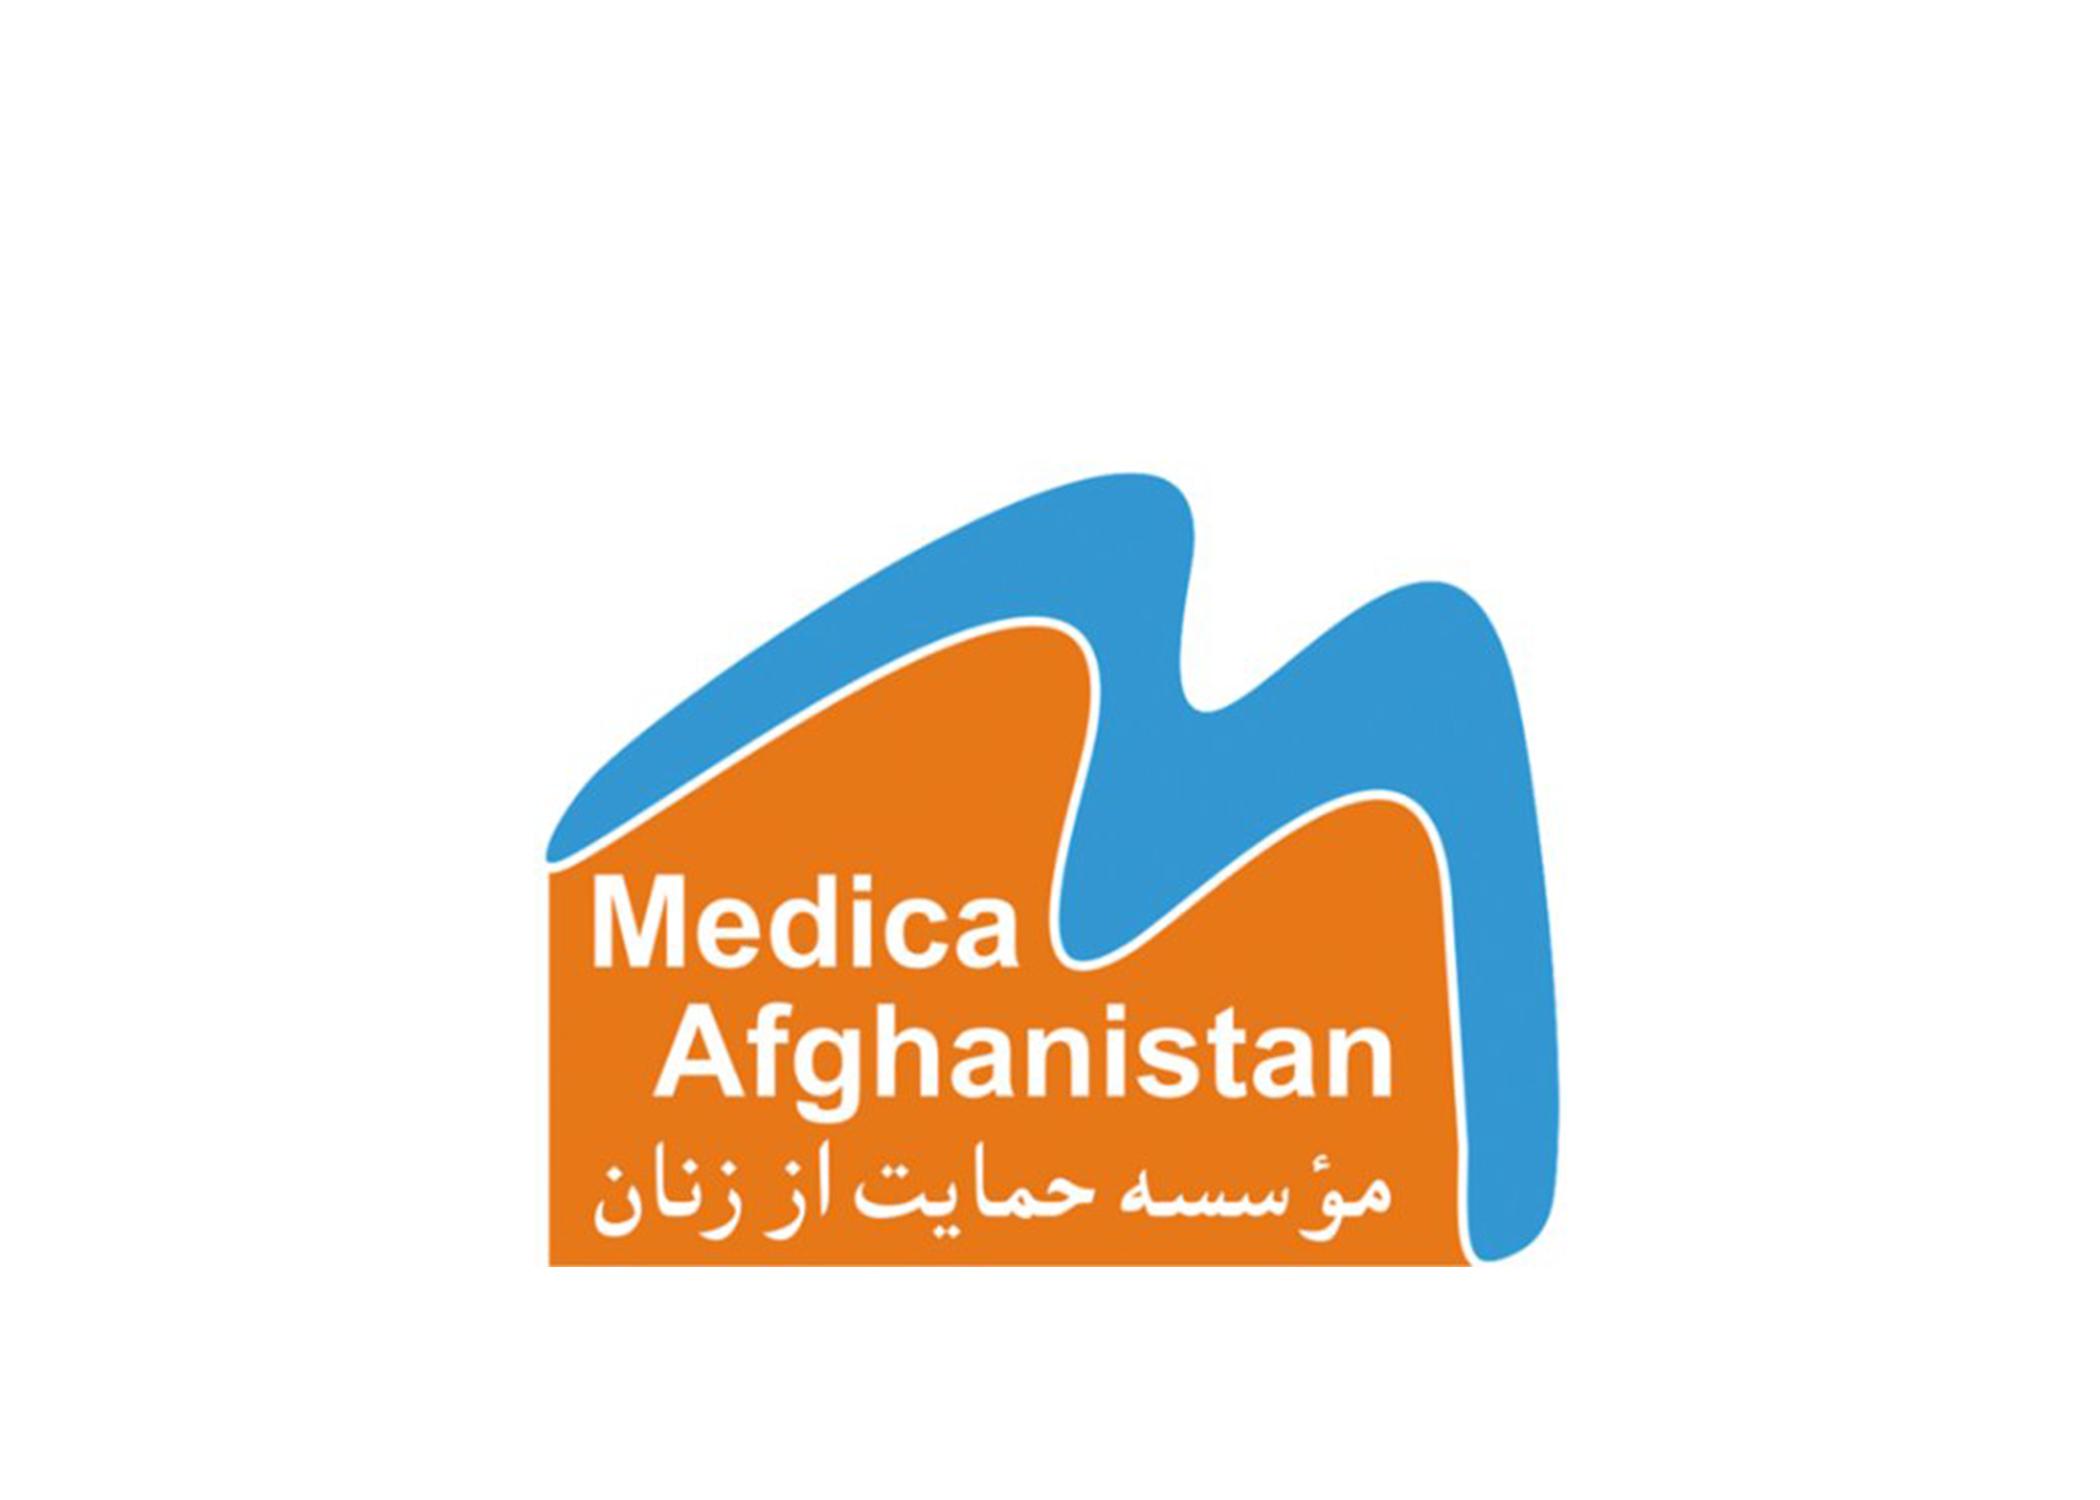 MEDICA-AFGHANISTAN